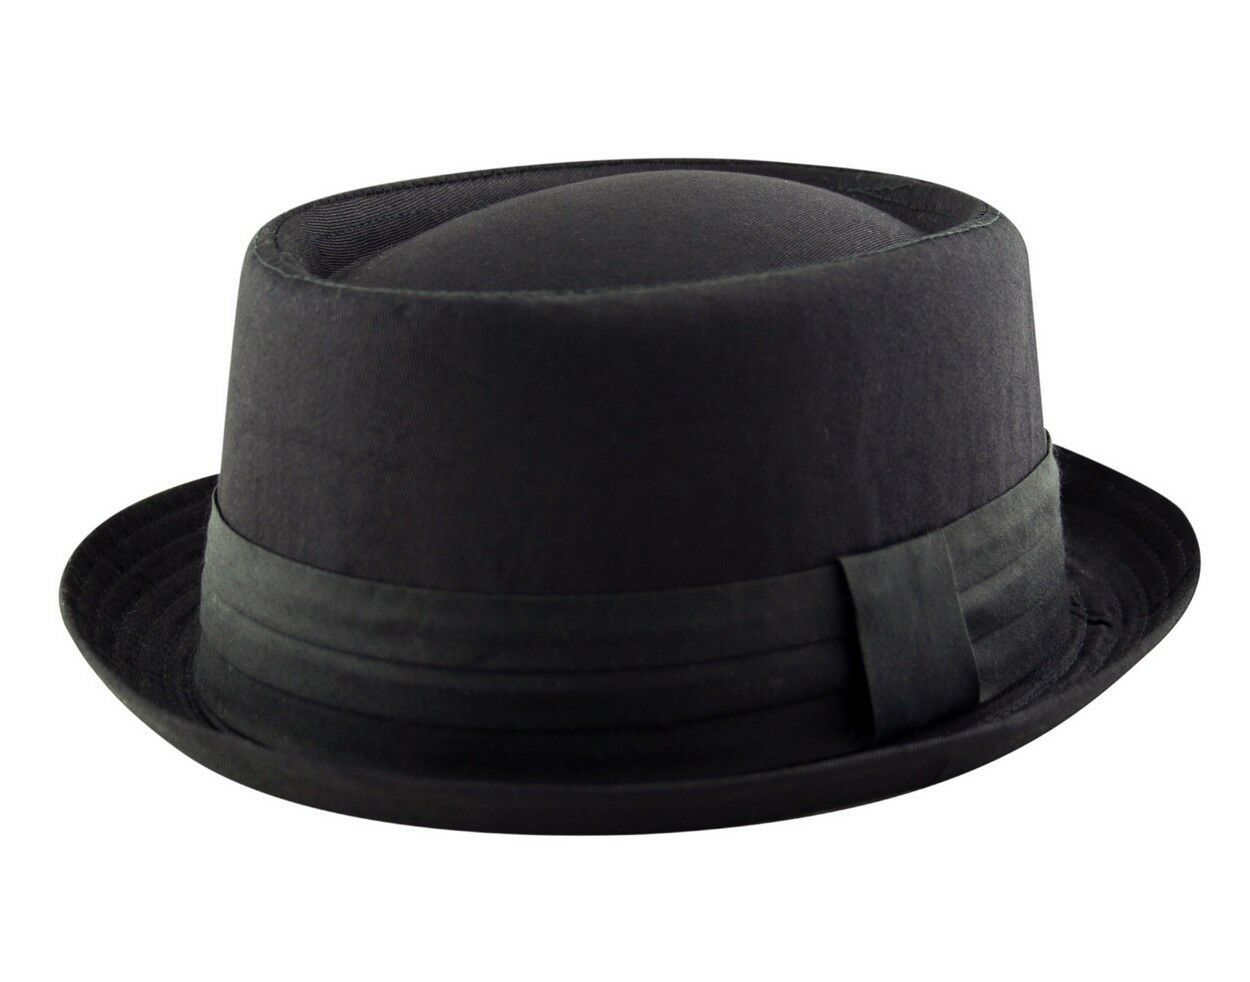 9706d6e59 HEISENBERG - BREAKING BAD - PORK PIE Trilby Porkpie Cotton Hat Cap Black